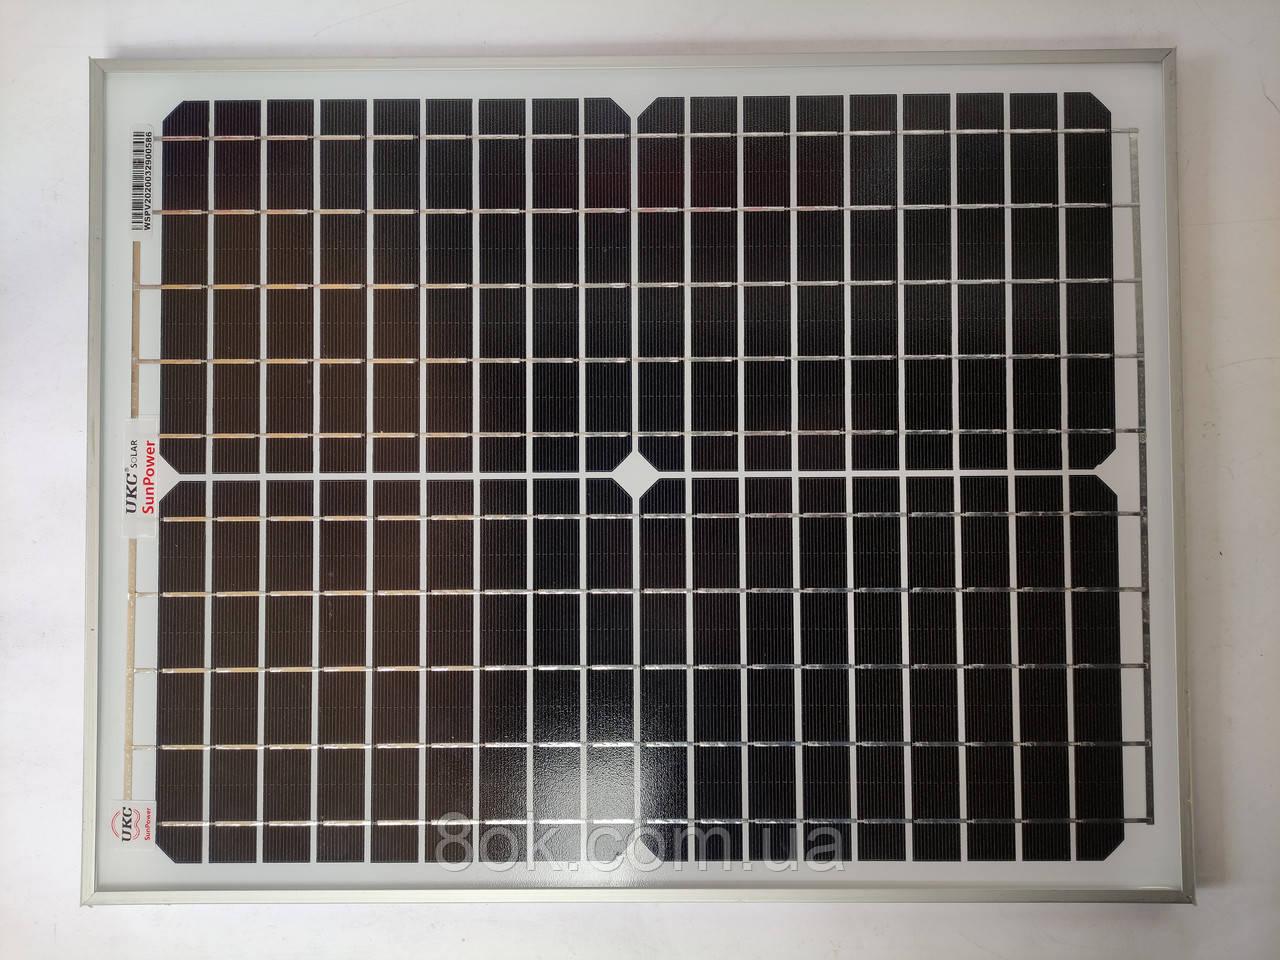 Солнечная панель батарея UKC 20W 18V